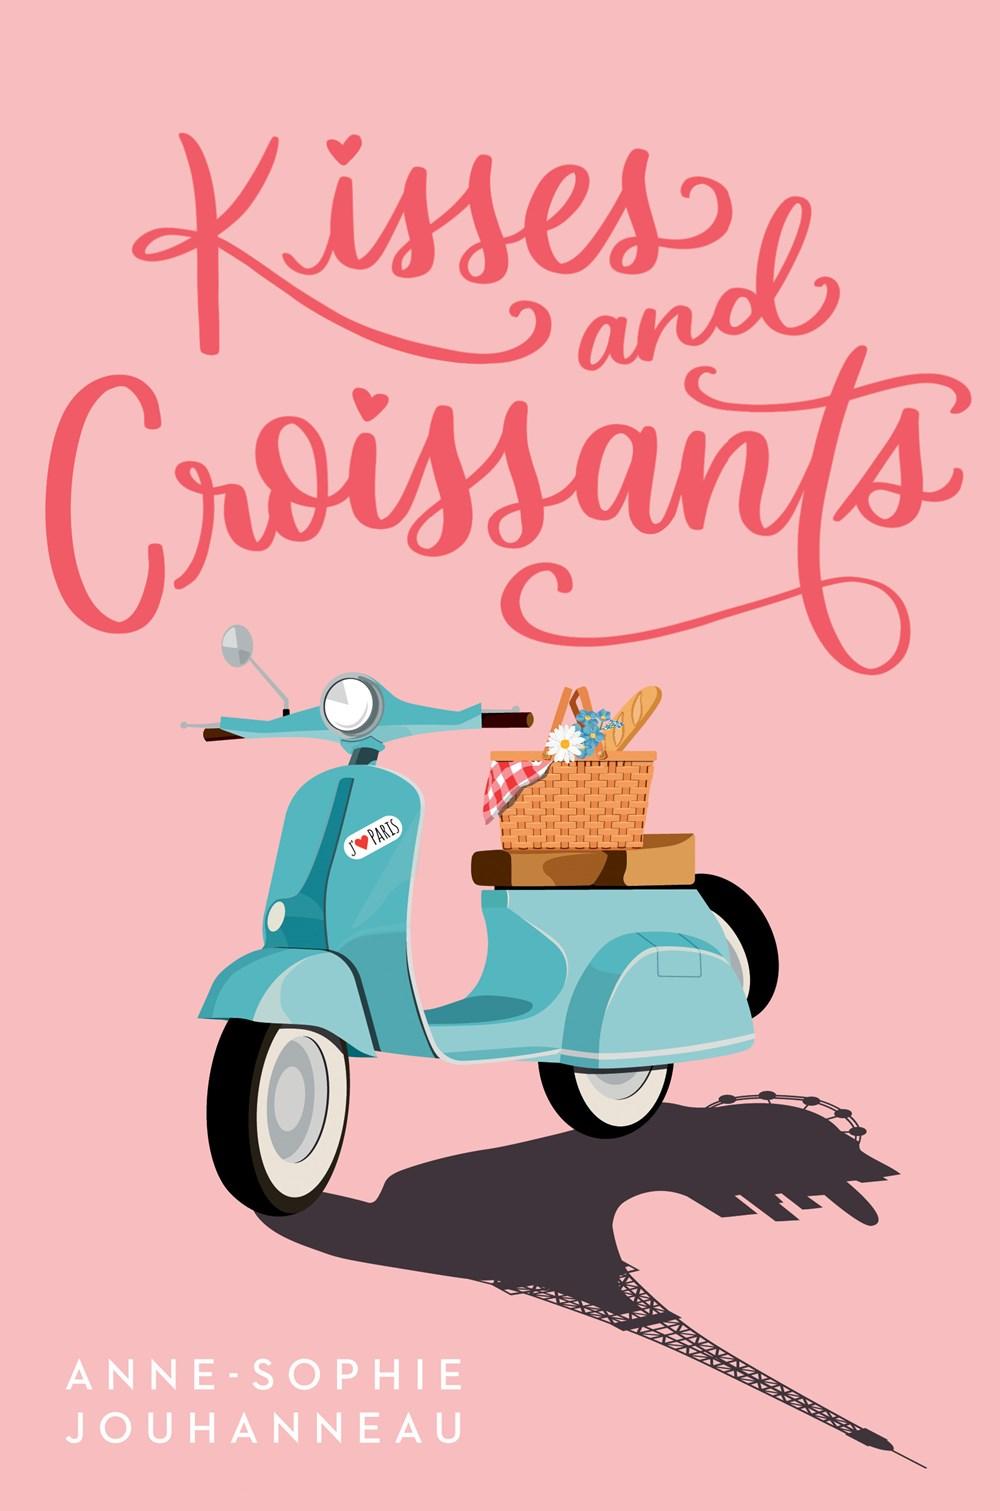 Book Review: Kisses & Croissants by Anne-Sophie Jouhanneau